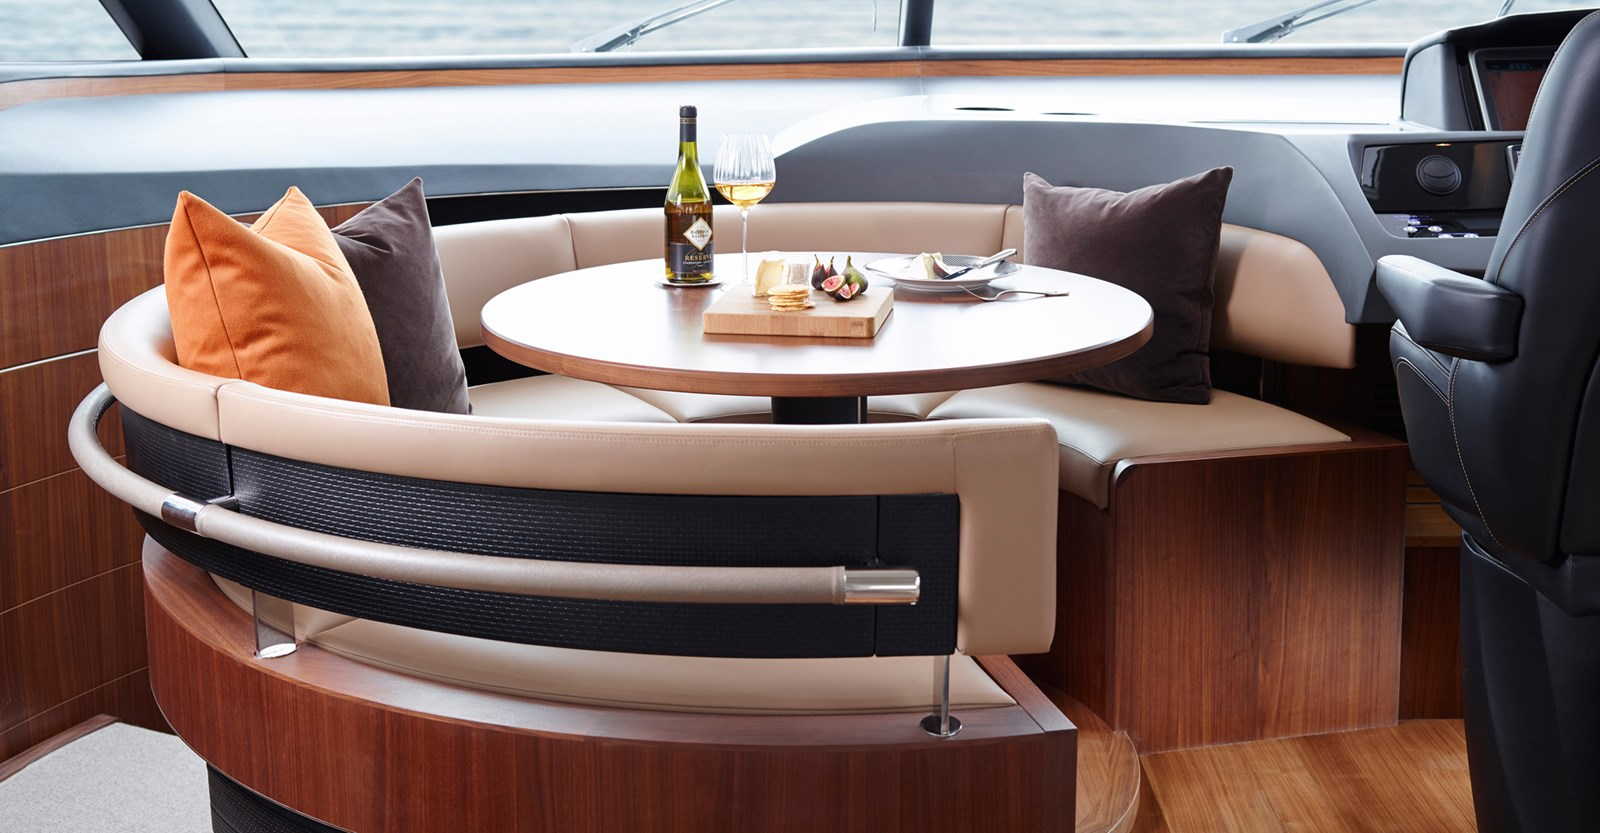 New Princess S72 Yacht Dining